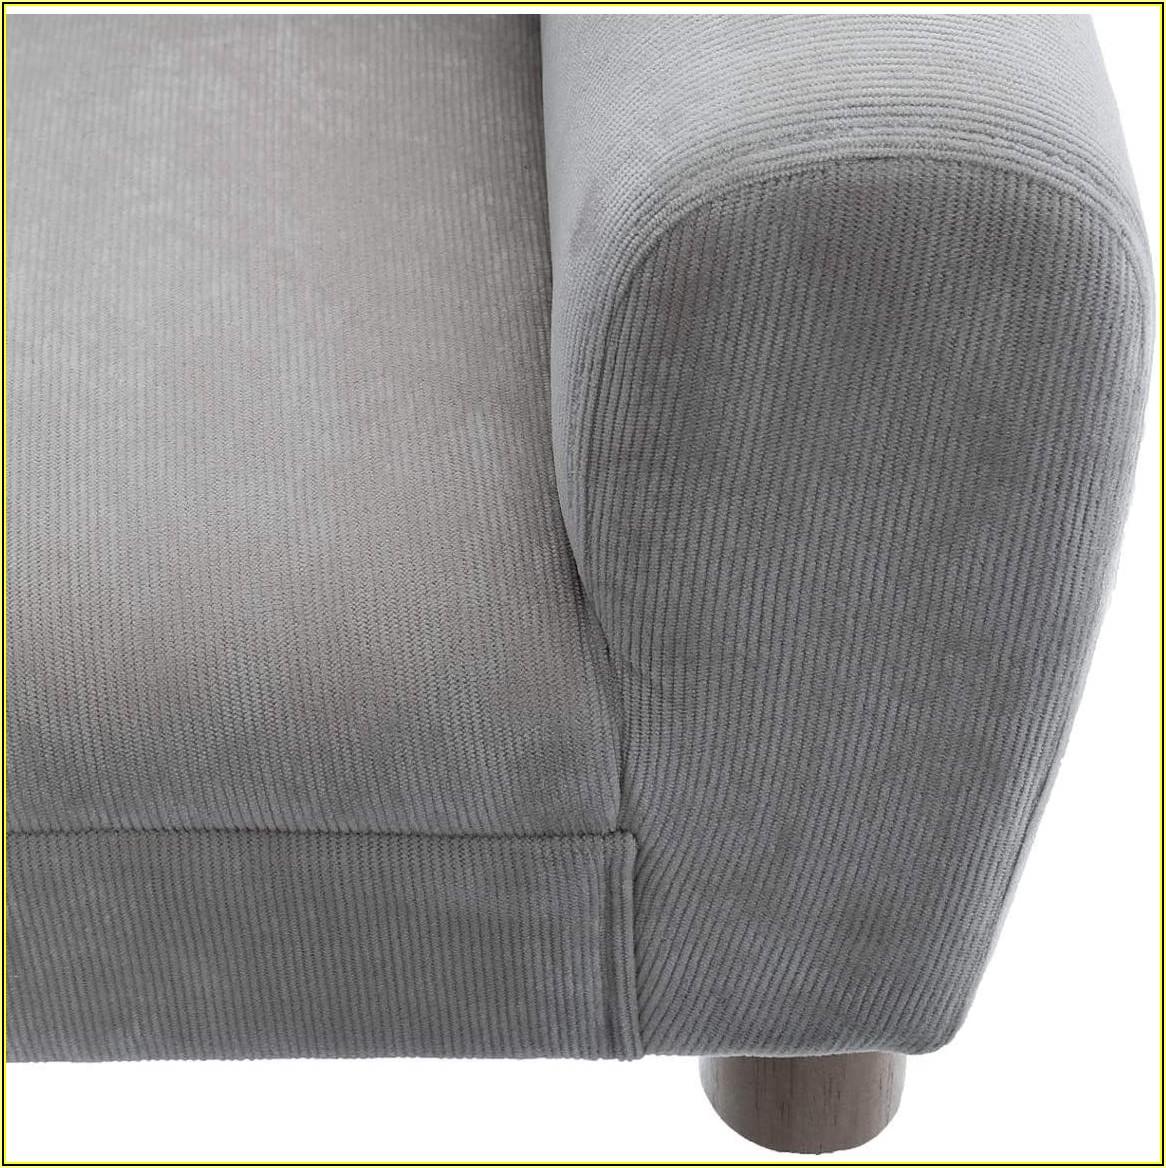 Sessel Kinderzimmer Grau